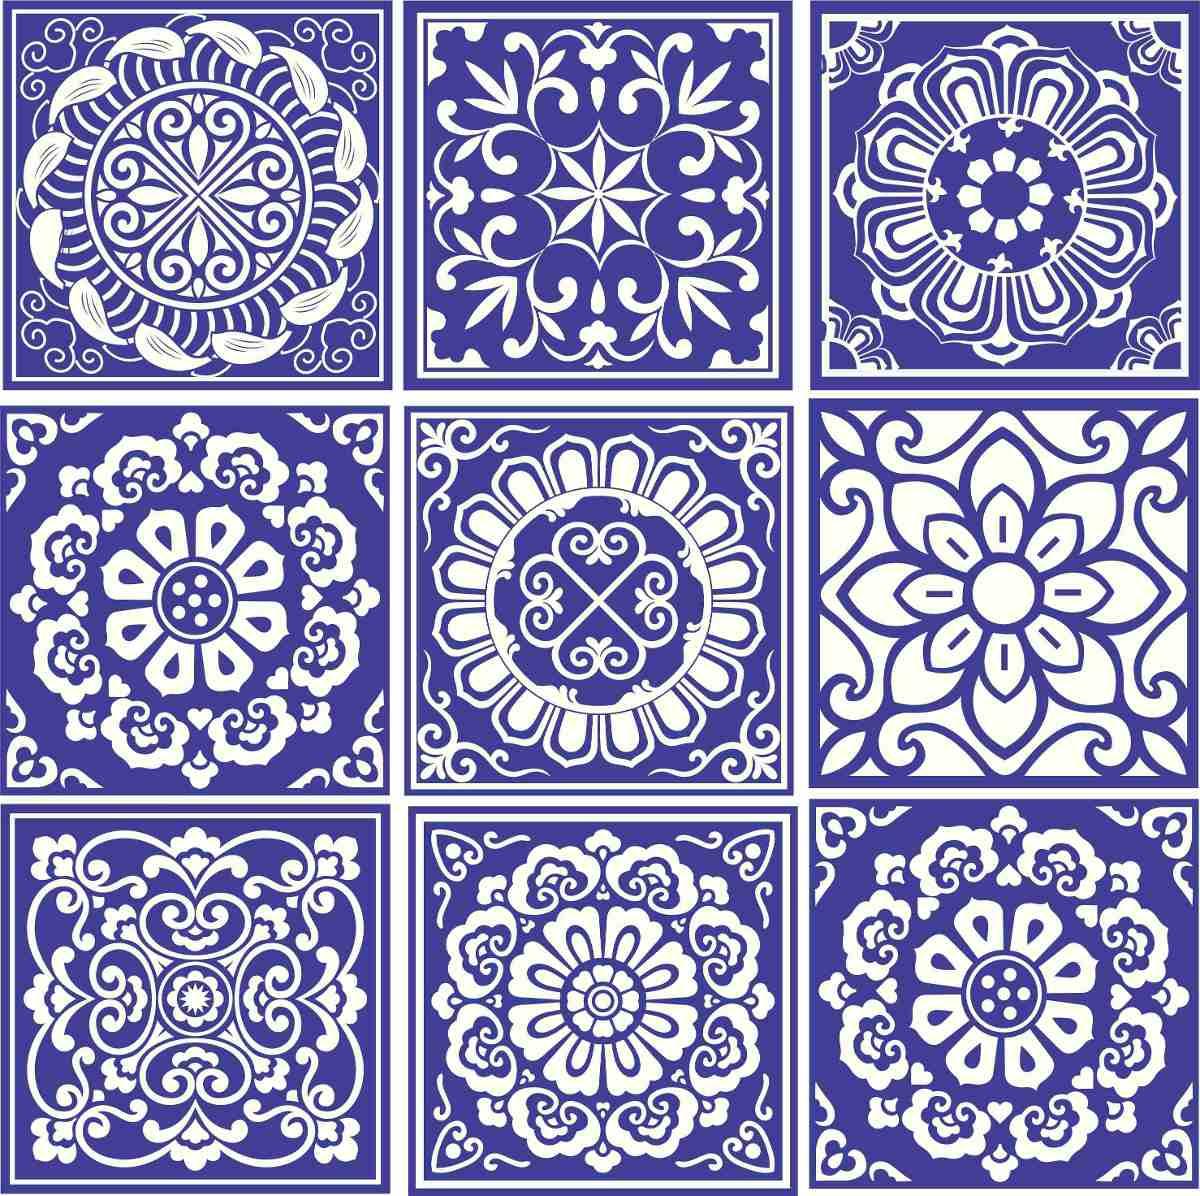 Adesivo Parede Ladrilho Faixa Azulejo Português Kit 9 Un R$ 29 99  #3A3299 1200x1196 Banheiro Azulejo Portugues